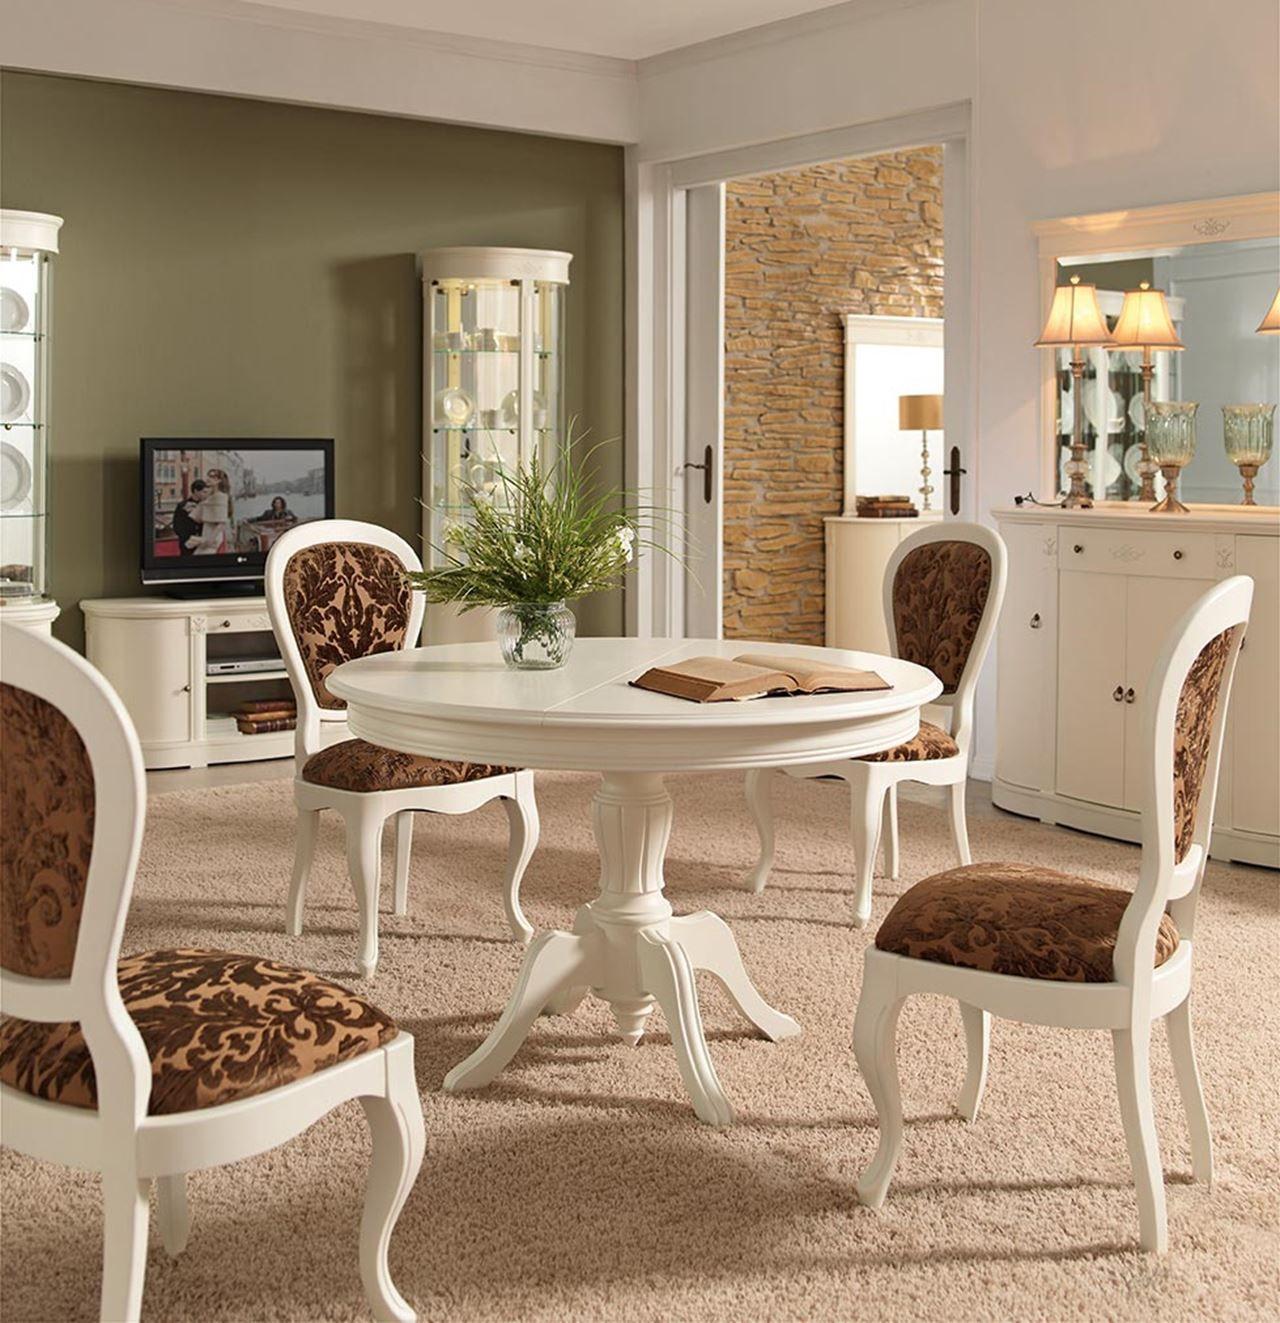 Dining sets by panamar muebles namarmuebles furniture